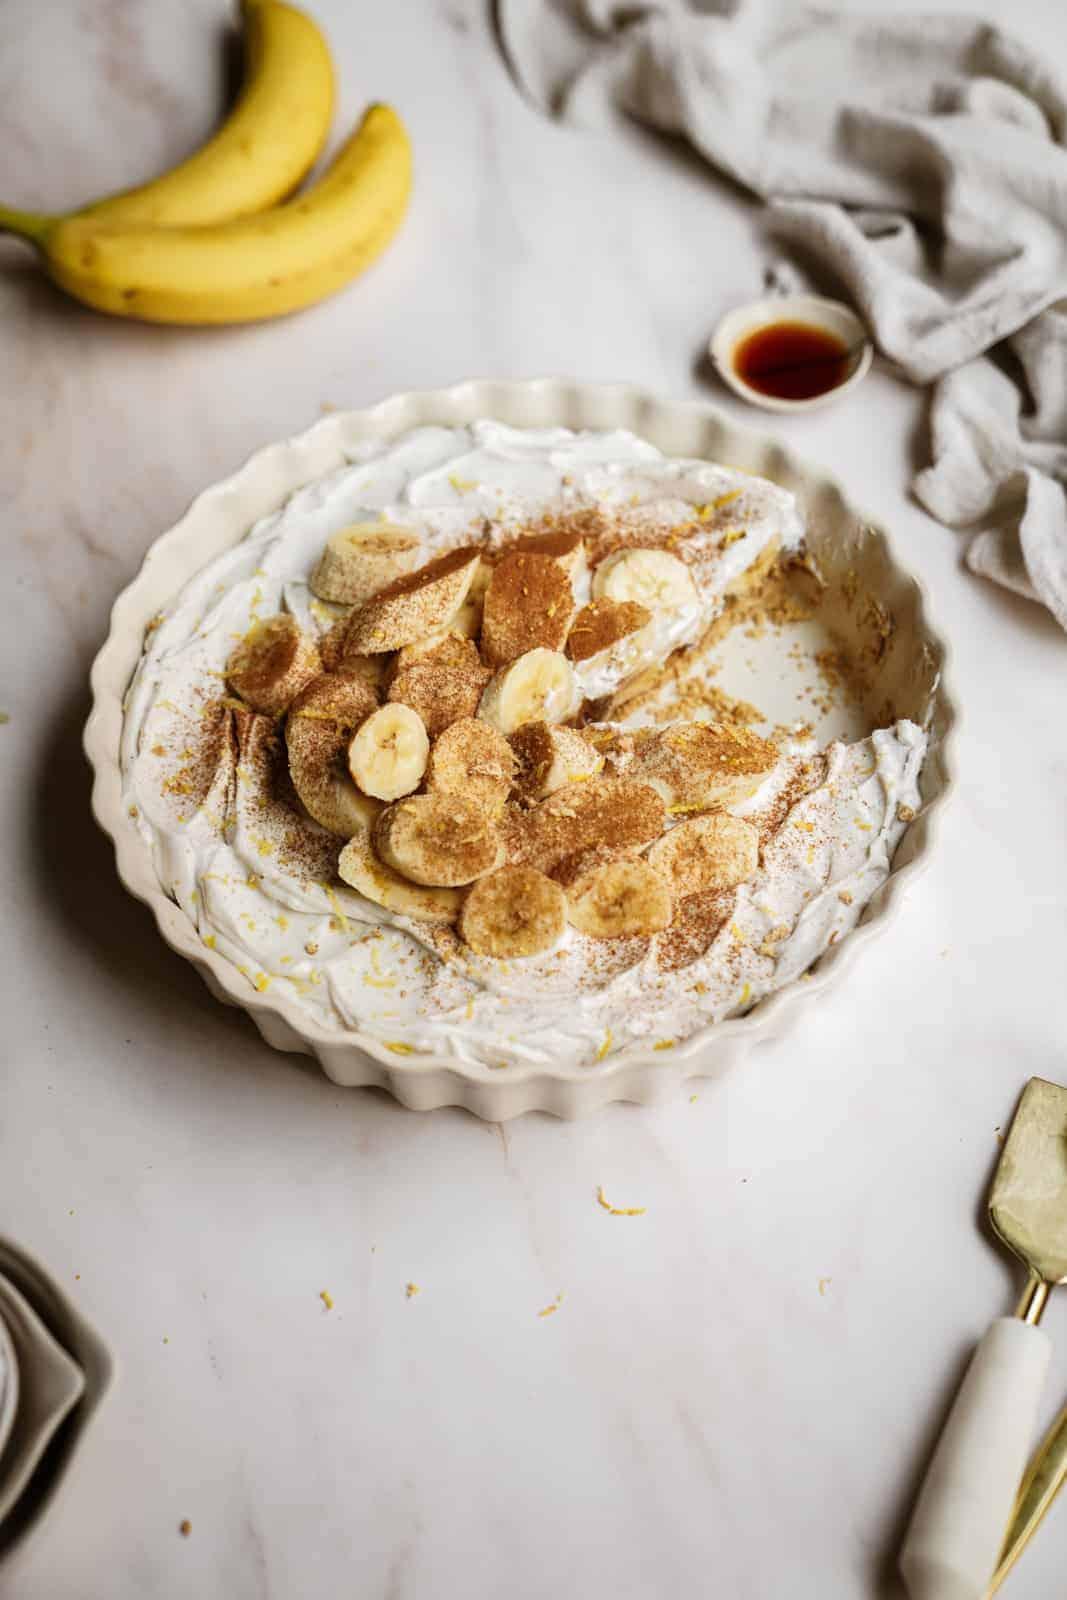 Easy Vegan Banana Cream Pie on countertop in pie plate